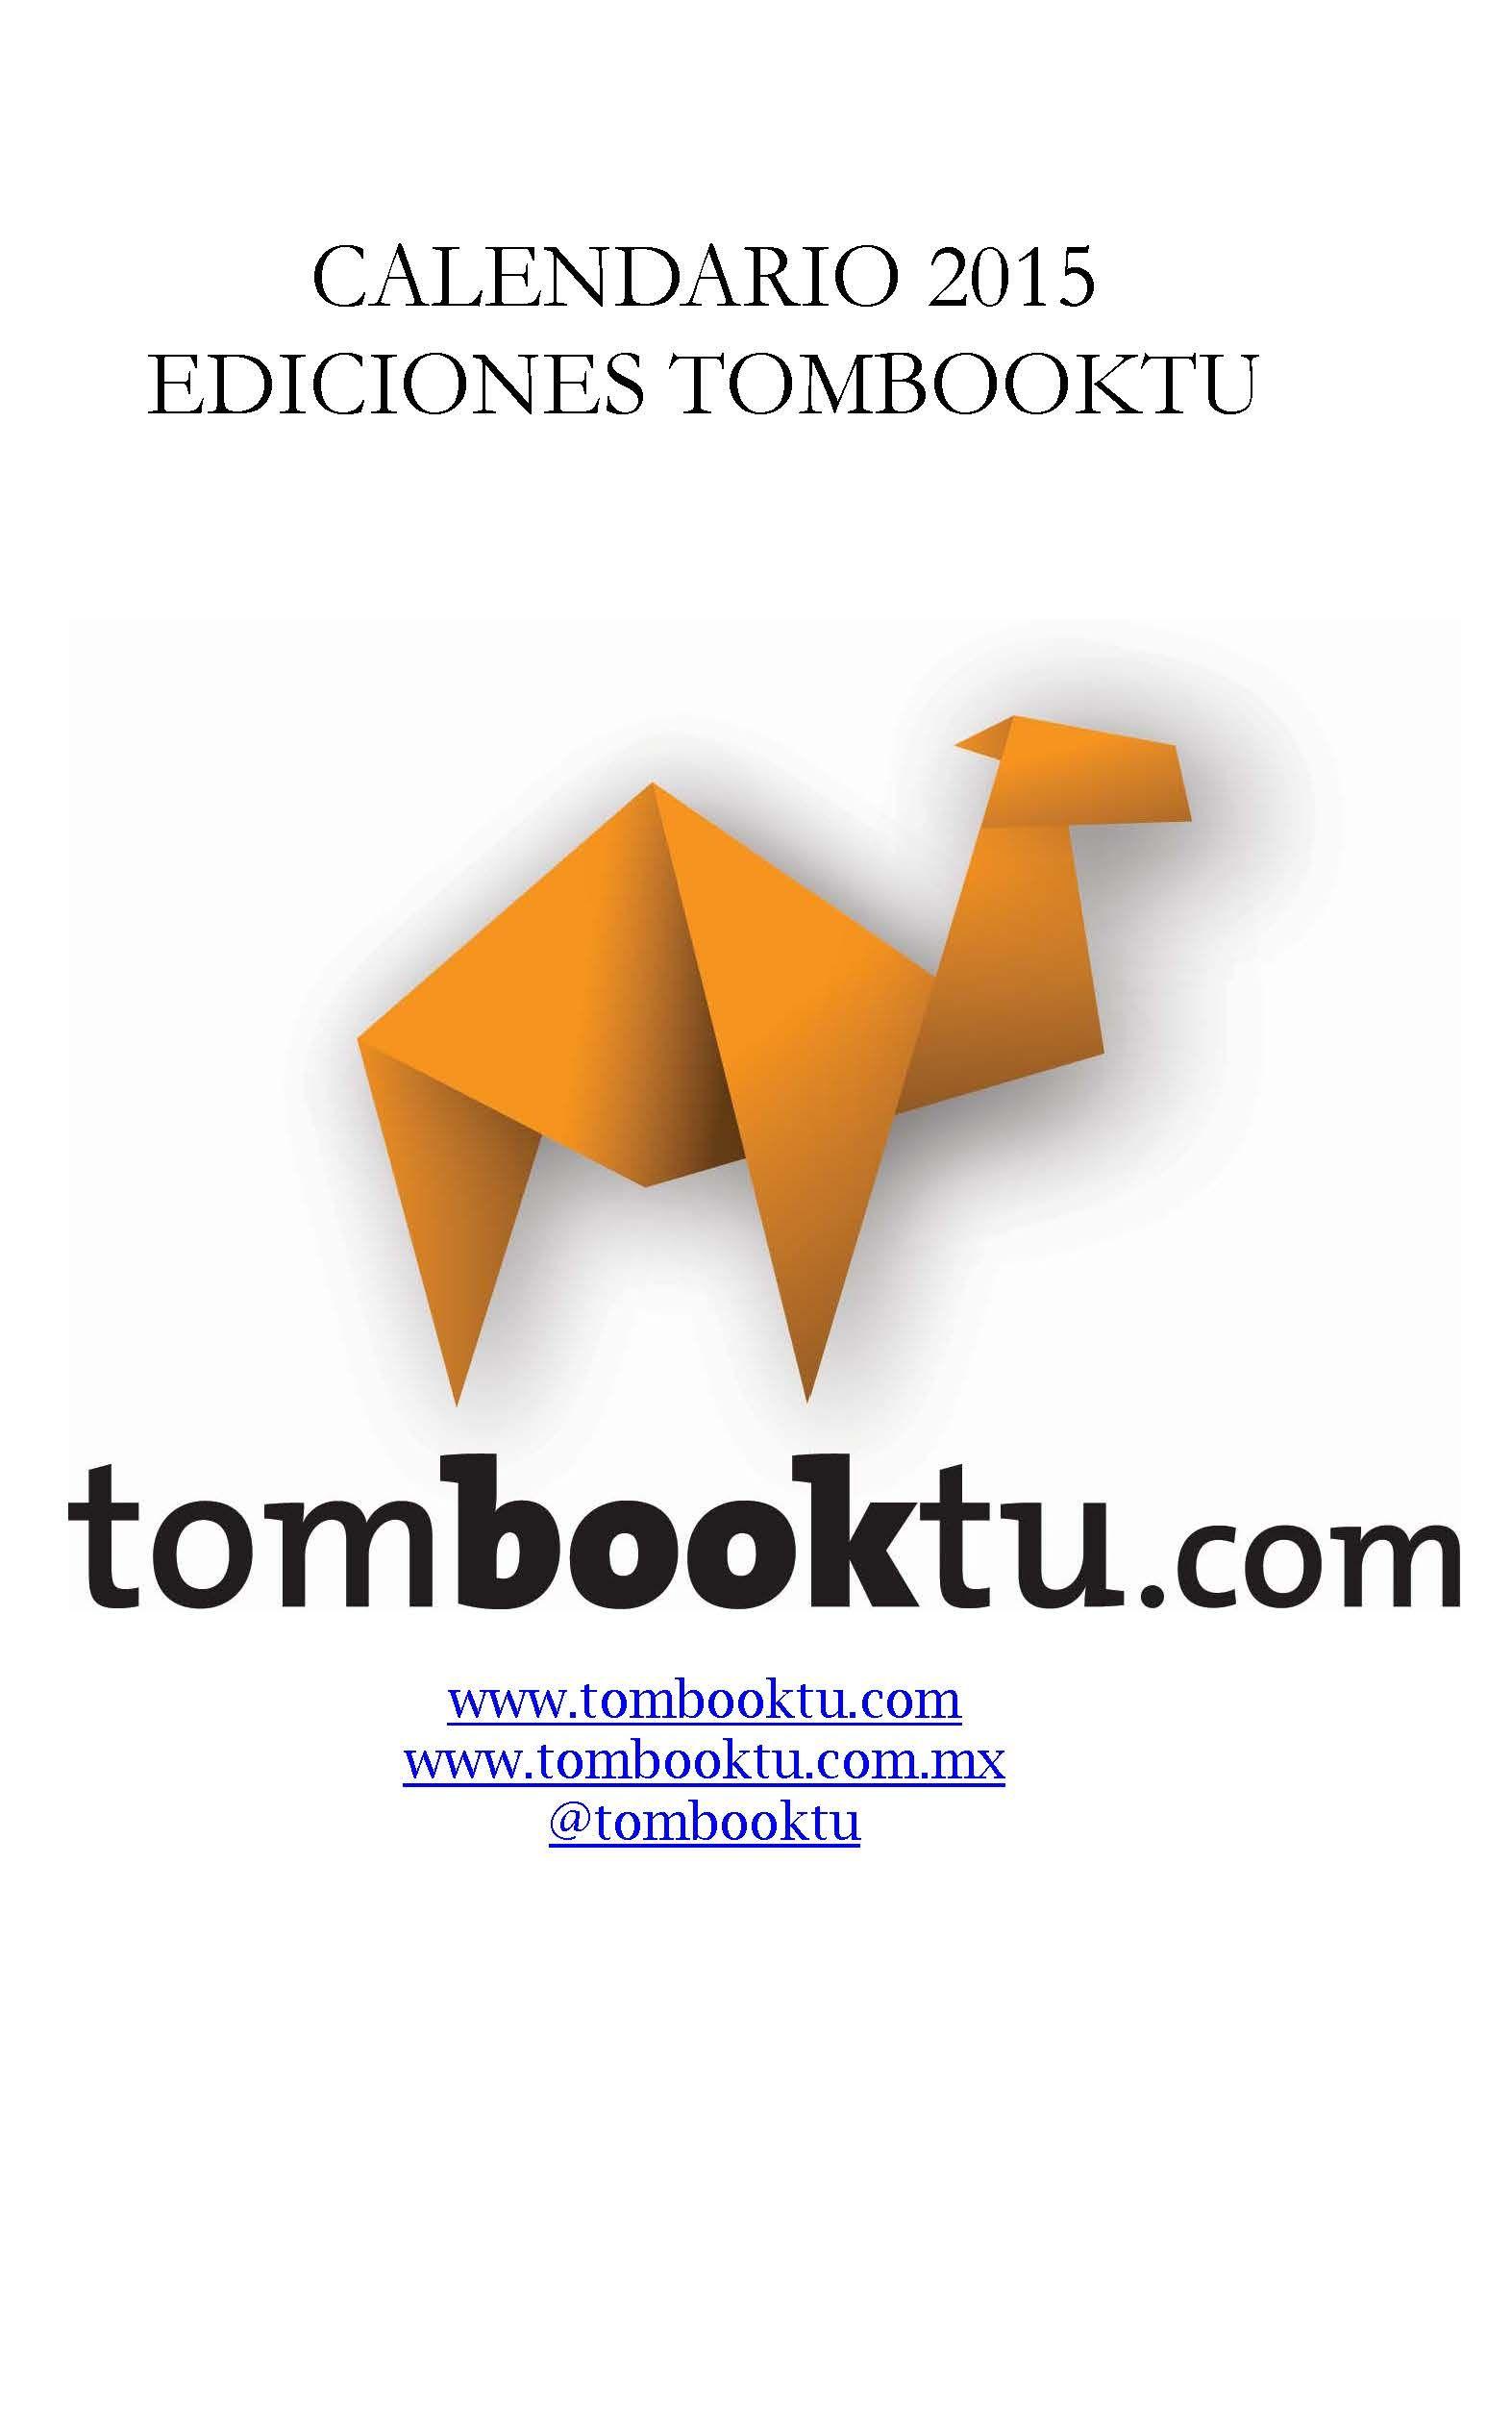 Portada del calendario de 2015: entero: http://www.nowtilus.com/descargas/Tombooktu/CALENDARIOTOMBOOKTU2015.pdf